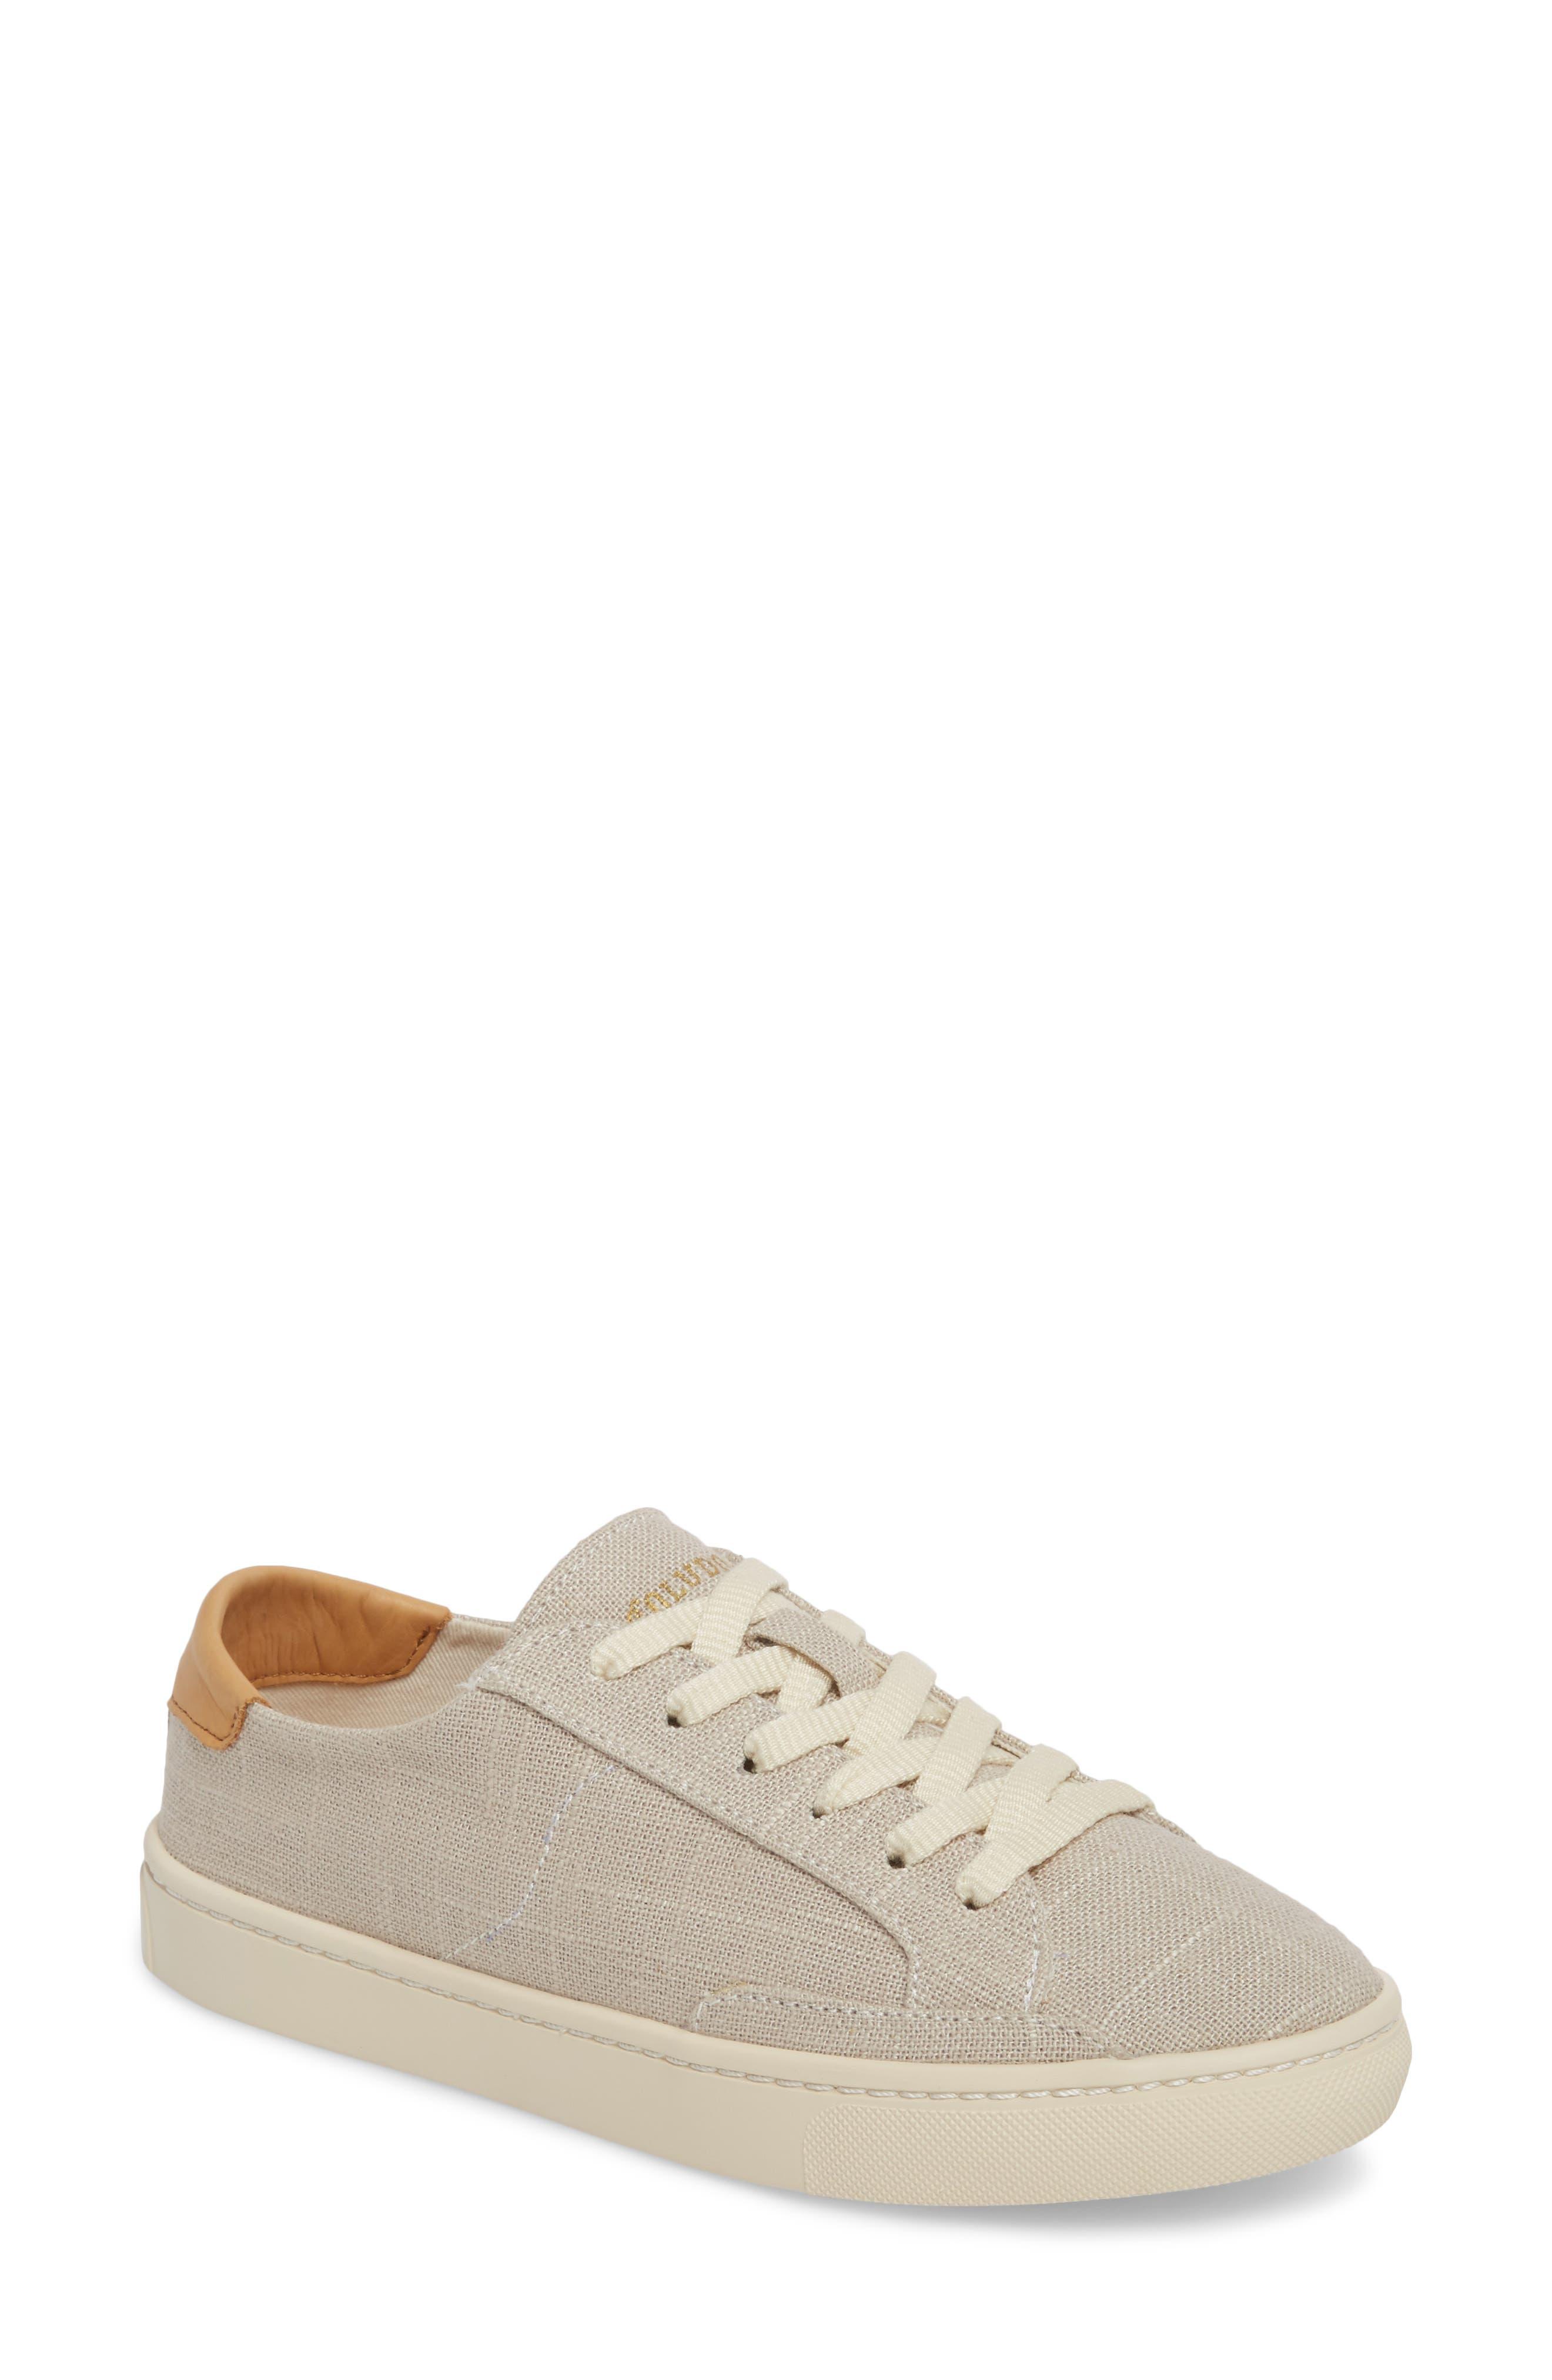 Ibiza Sneaker,                         Main,                         color, 050